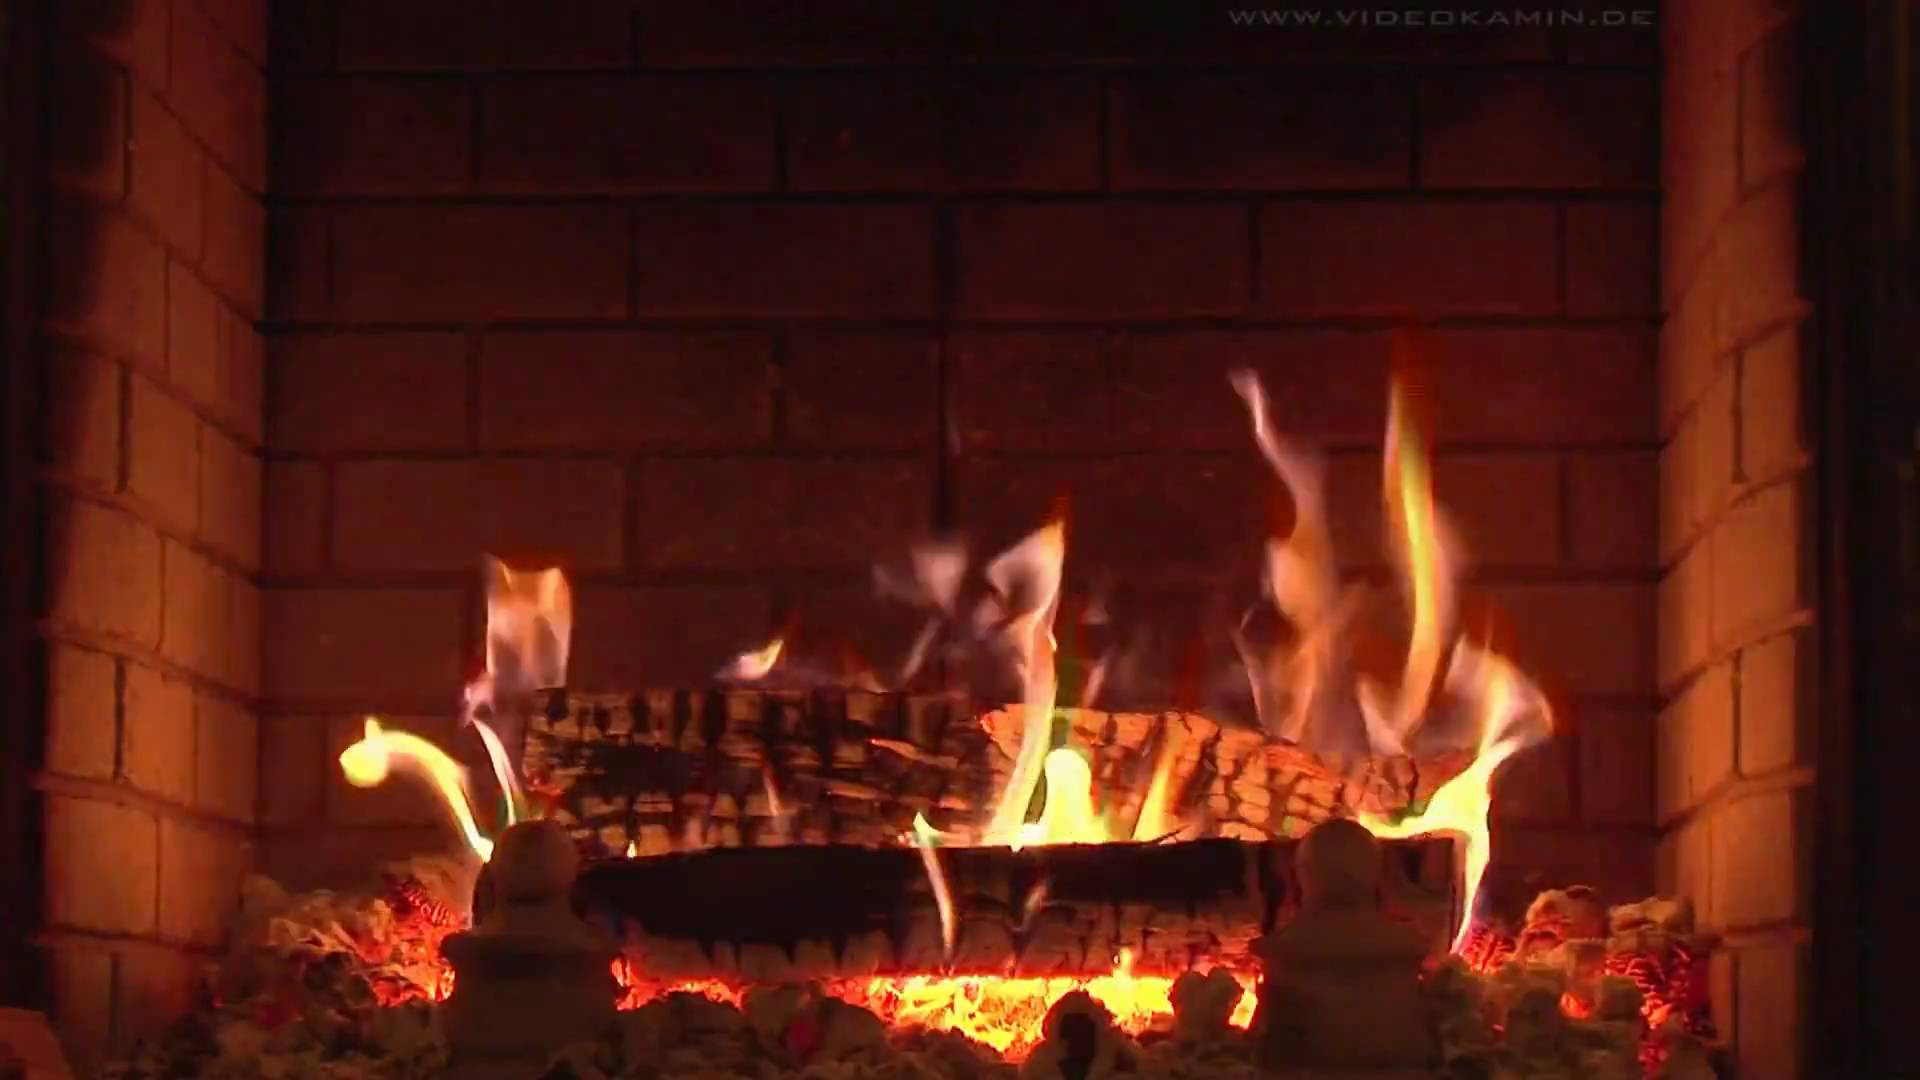 Best of Living Fireplace Videokamin FULL HD 1080p Download 1920x1080